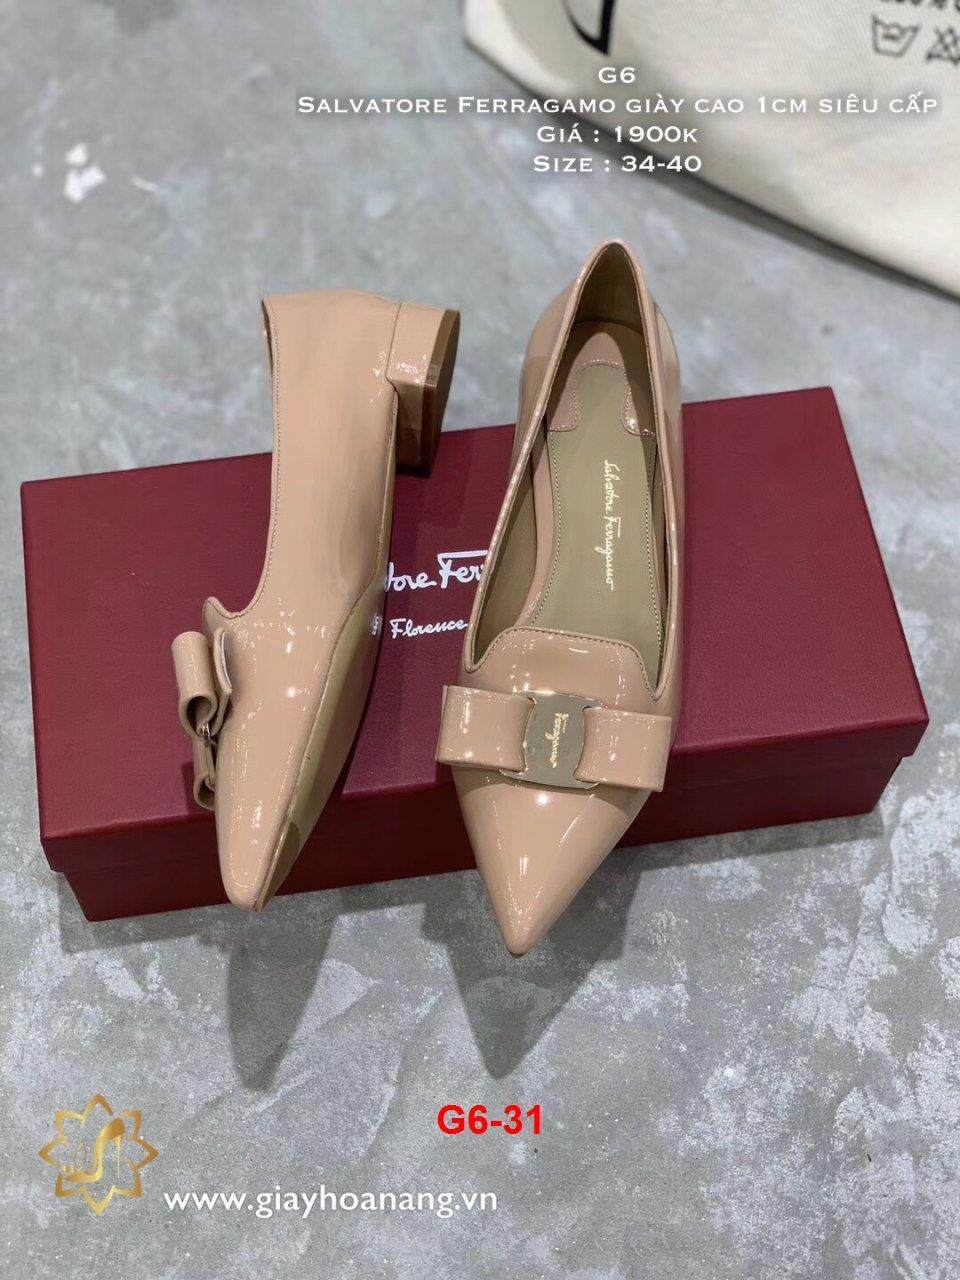 G6-31 Salvatore Ferragamo giày cao 1cm siêu cấp